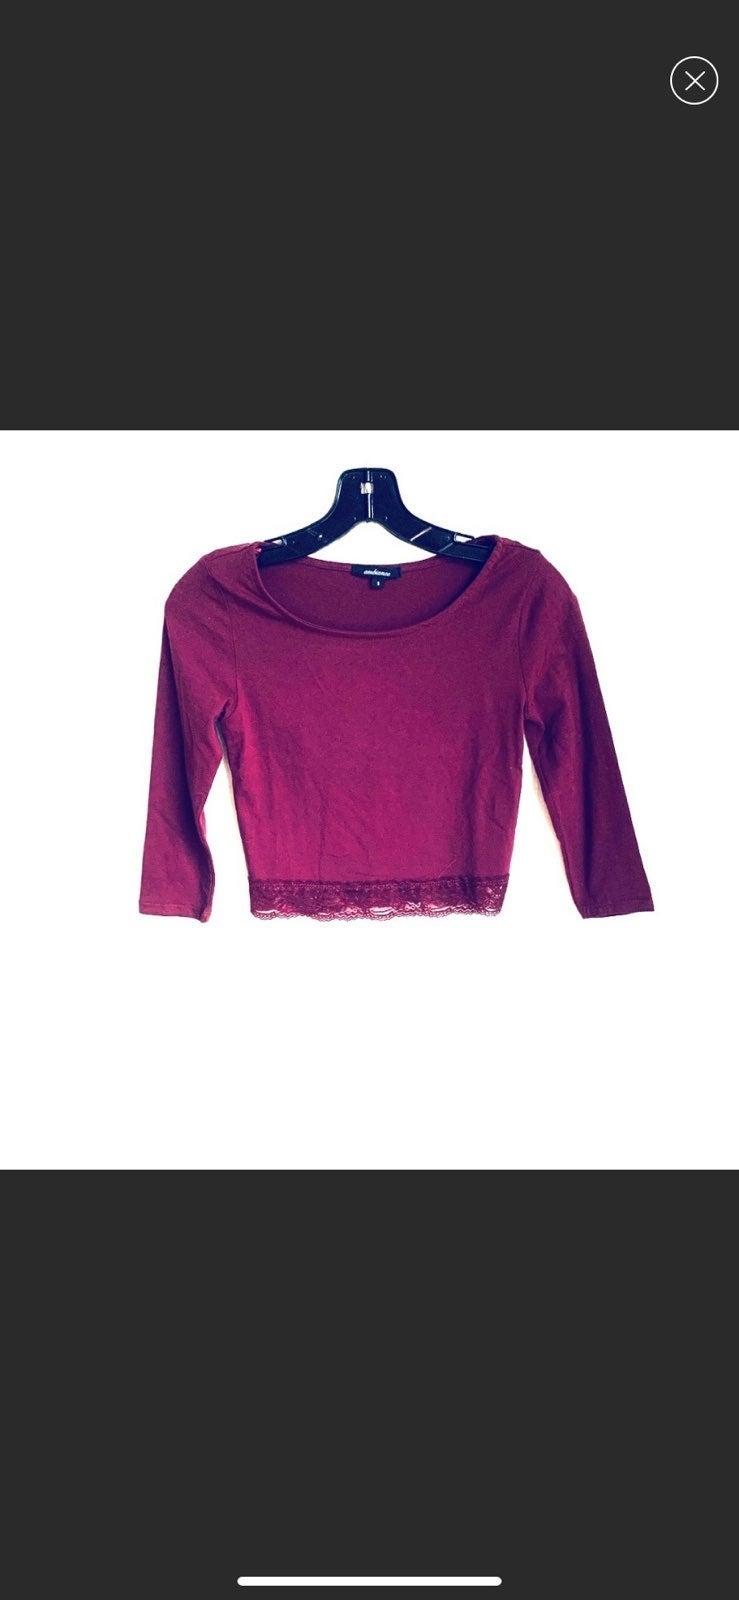 NWOT Cute Burgundy CropTop w/ Lace Waist